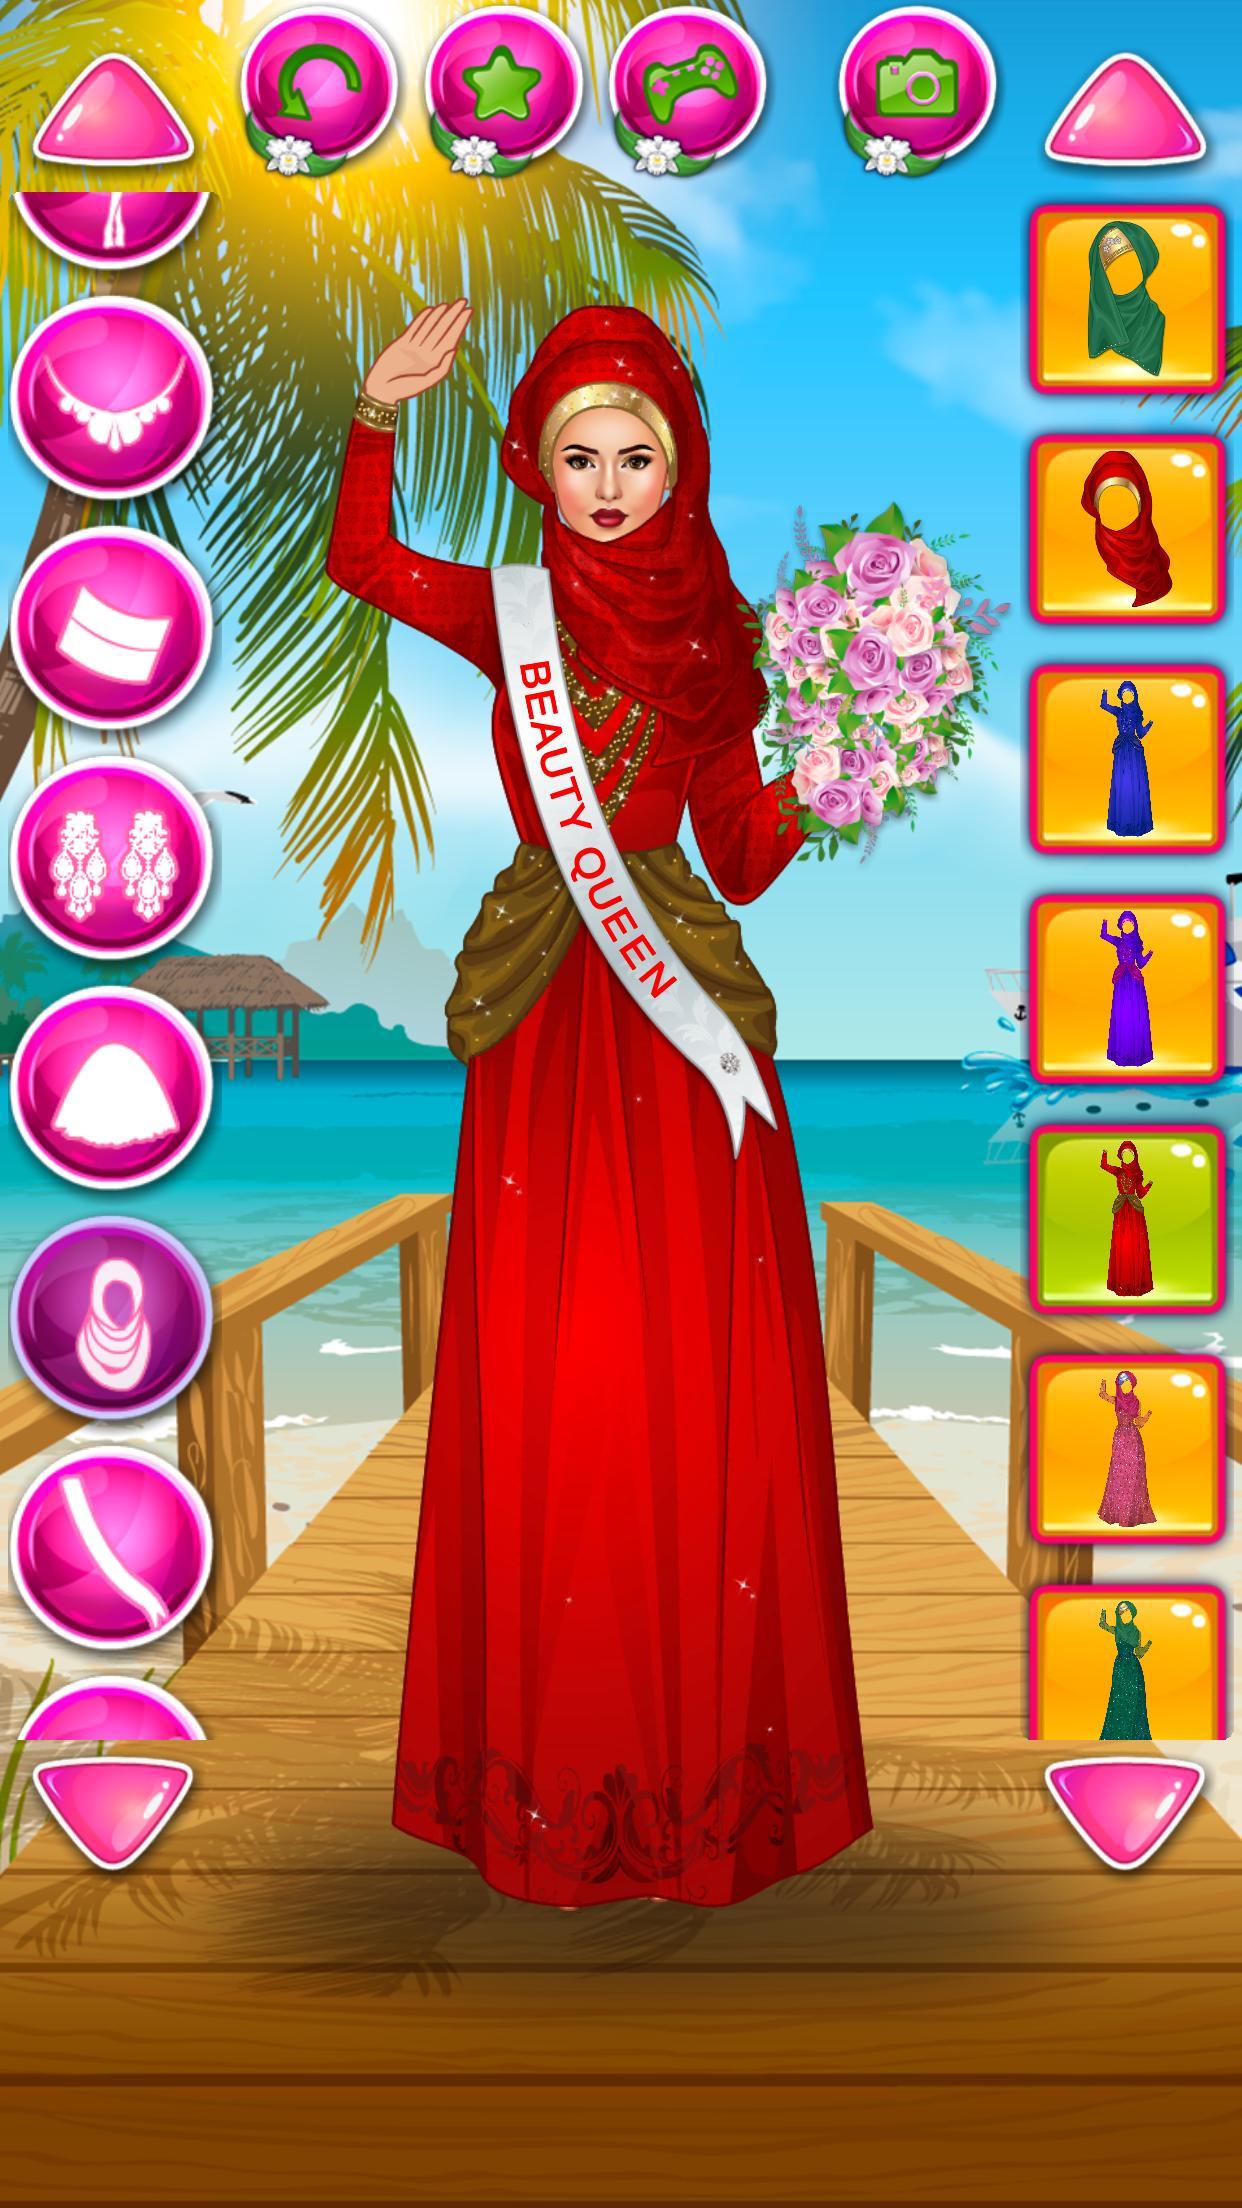 Beauty Queen Dress Up - Star Girl Fashion 1.1 Screenshot 21